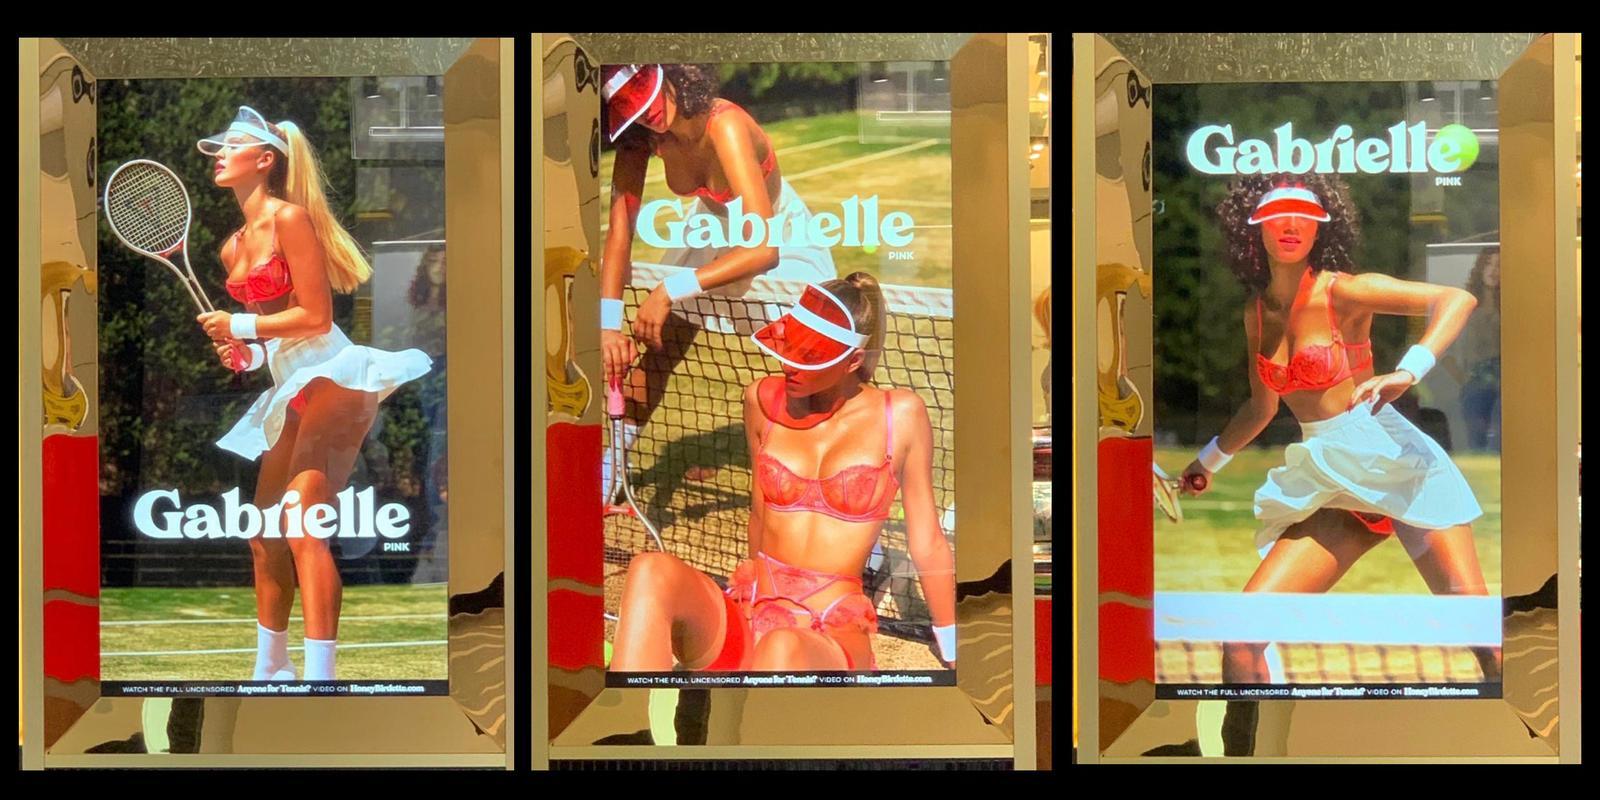 HB_tennis_cover_image.jpeg